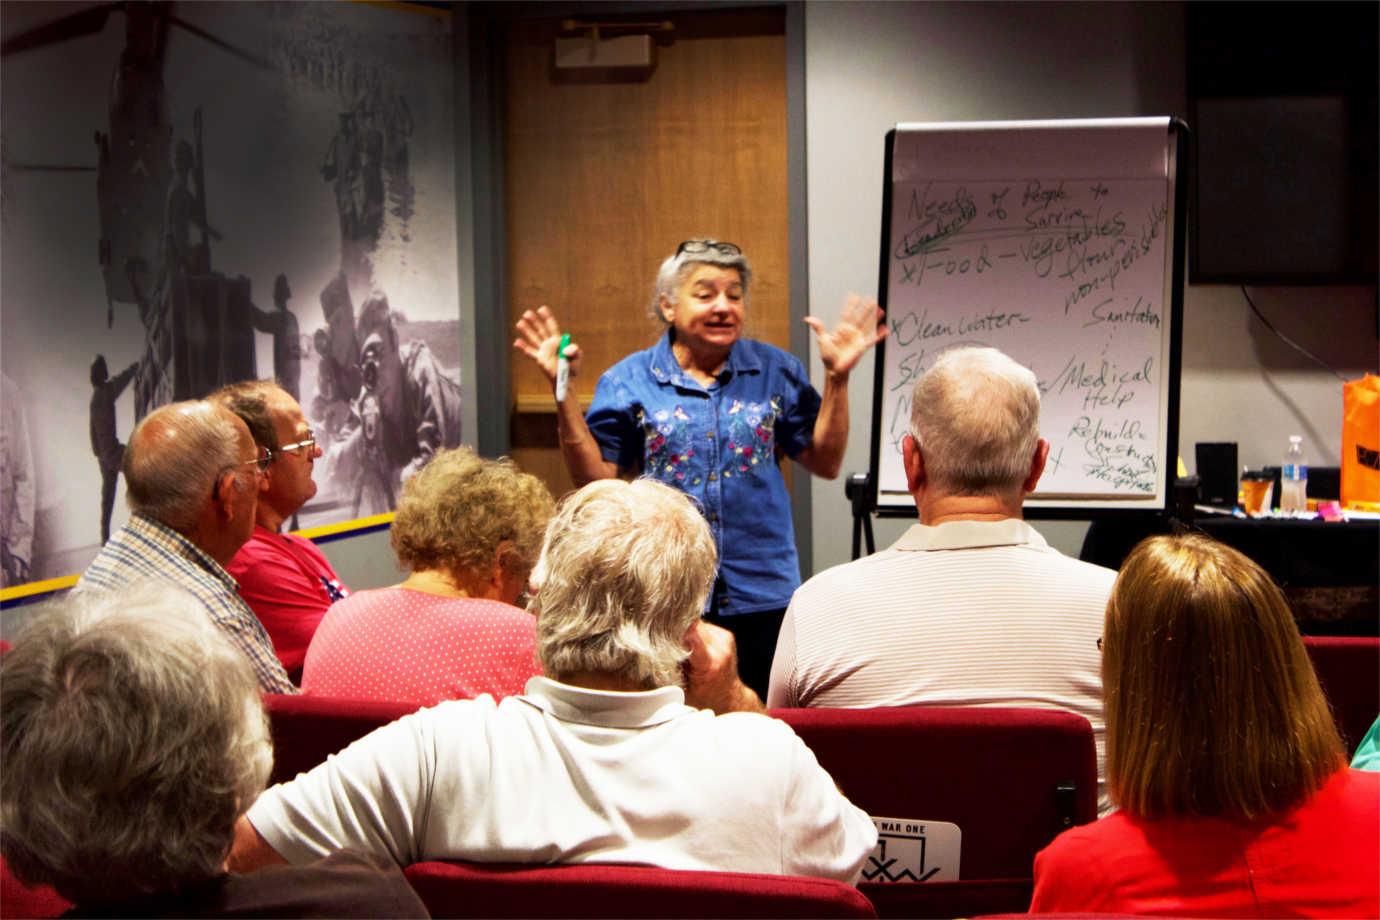 Chautauqua scholar Helen Lewis discusses food and medicine during World War I. Image courtesy of Humanities Nebraska.